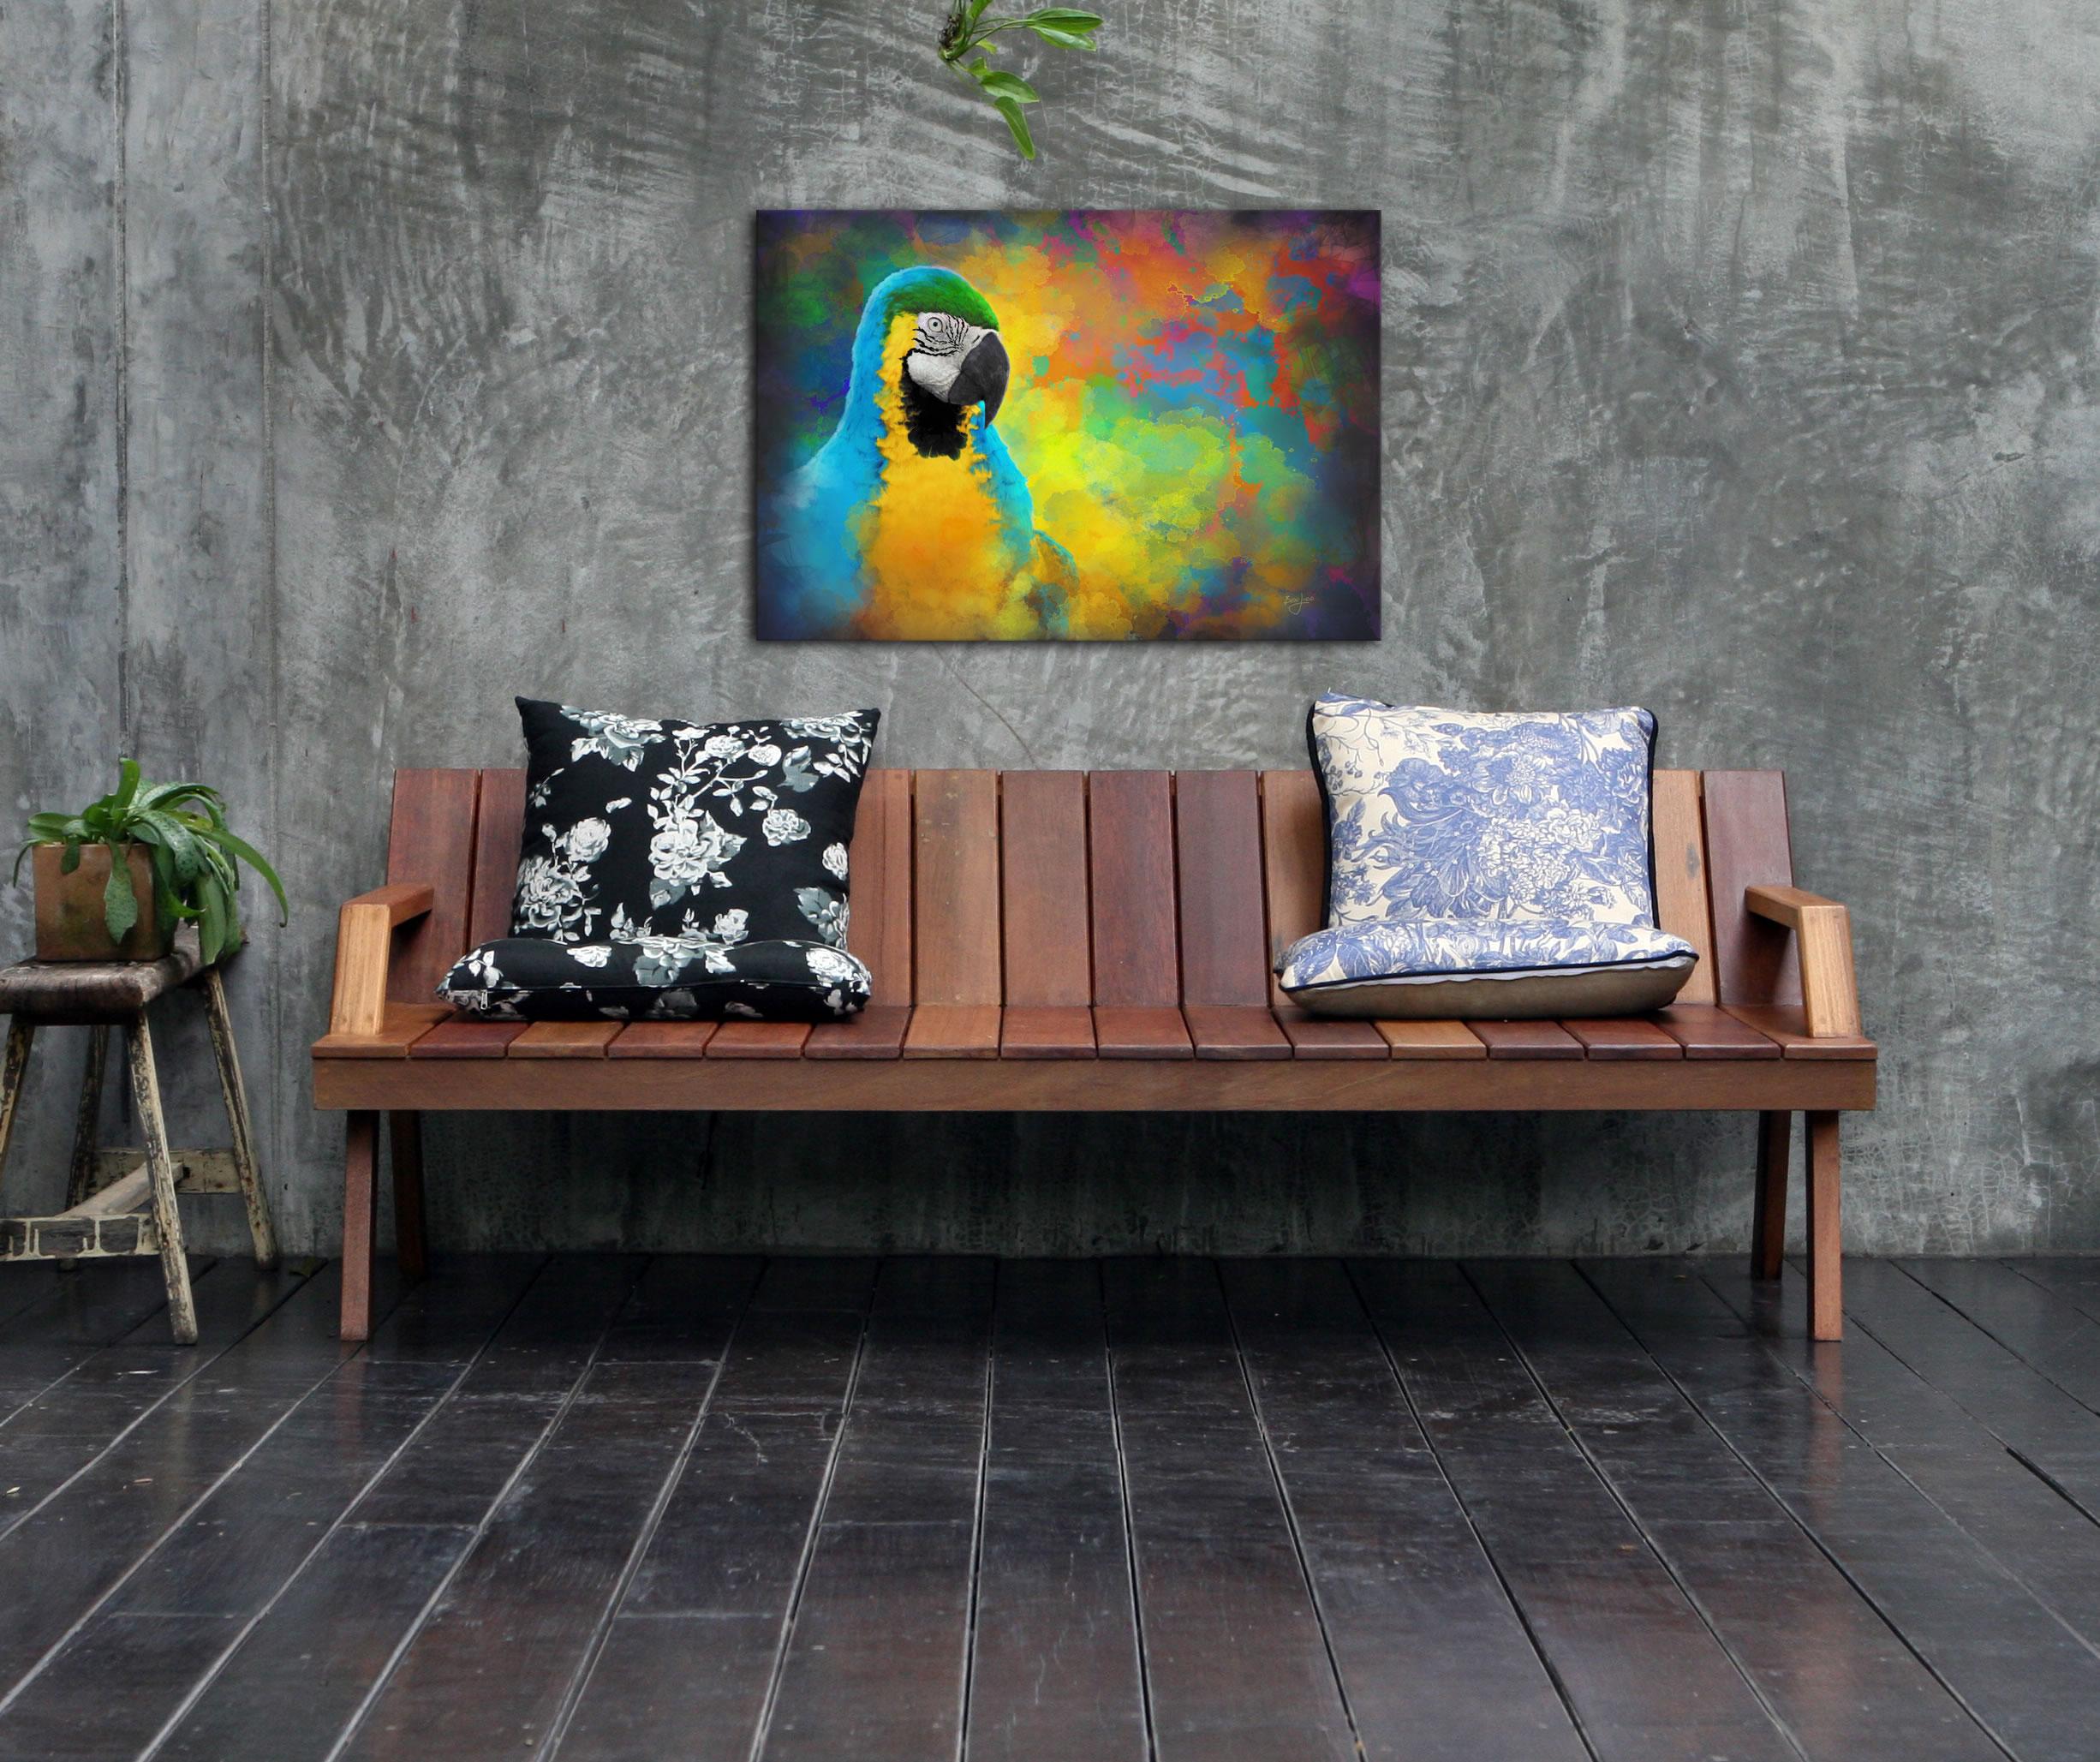 Parrot Splotch - Contemporary Rainbow Bird Art on Metal - Lifestyle Image